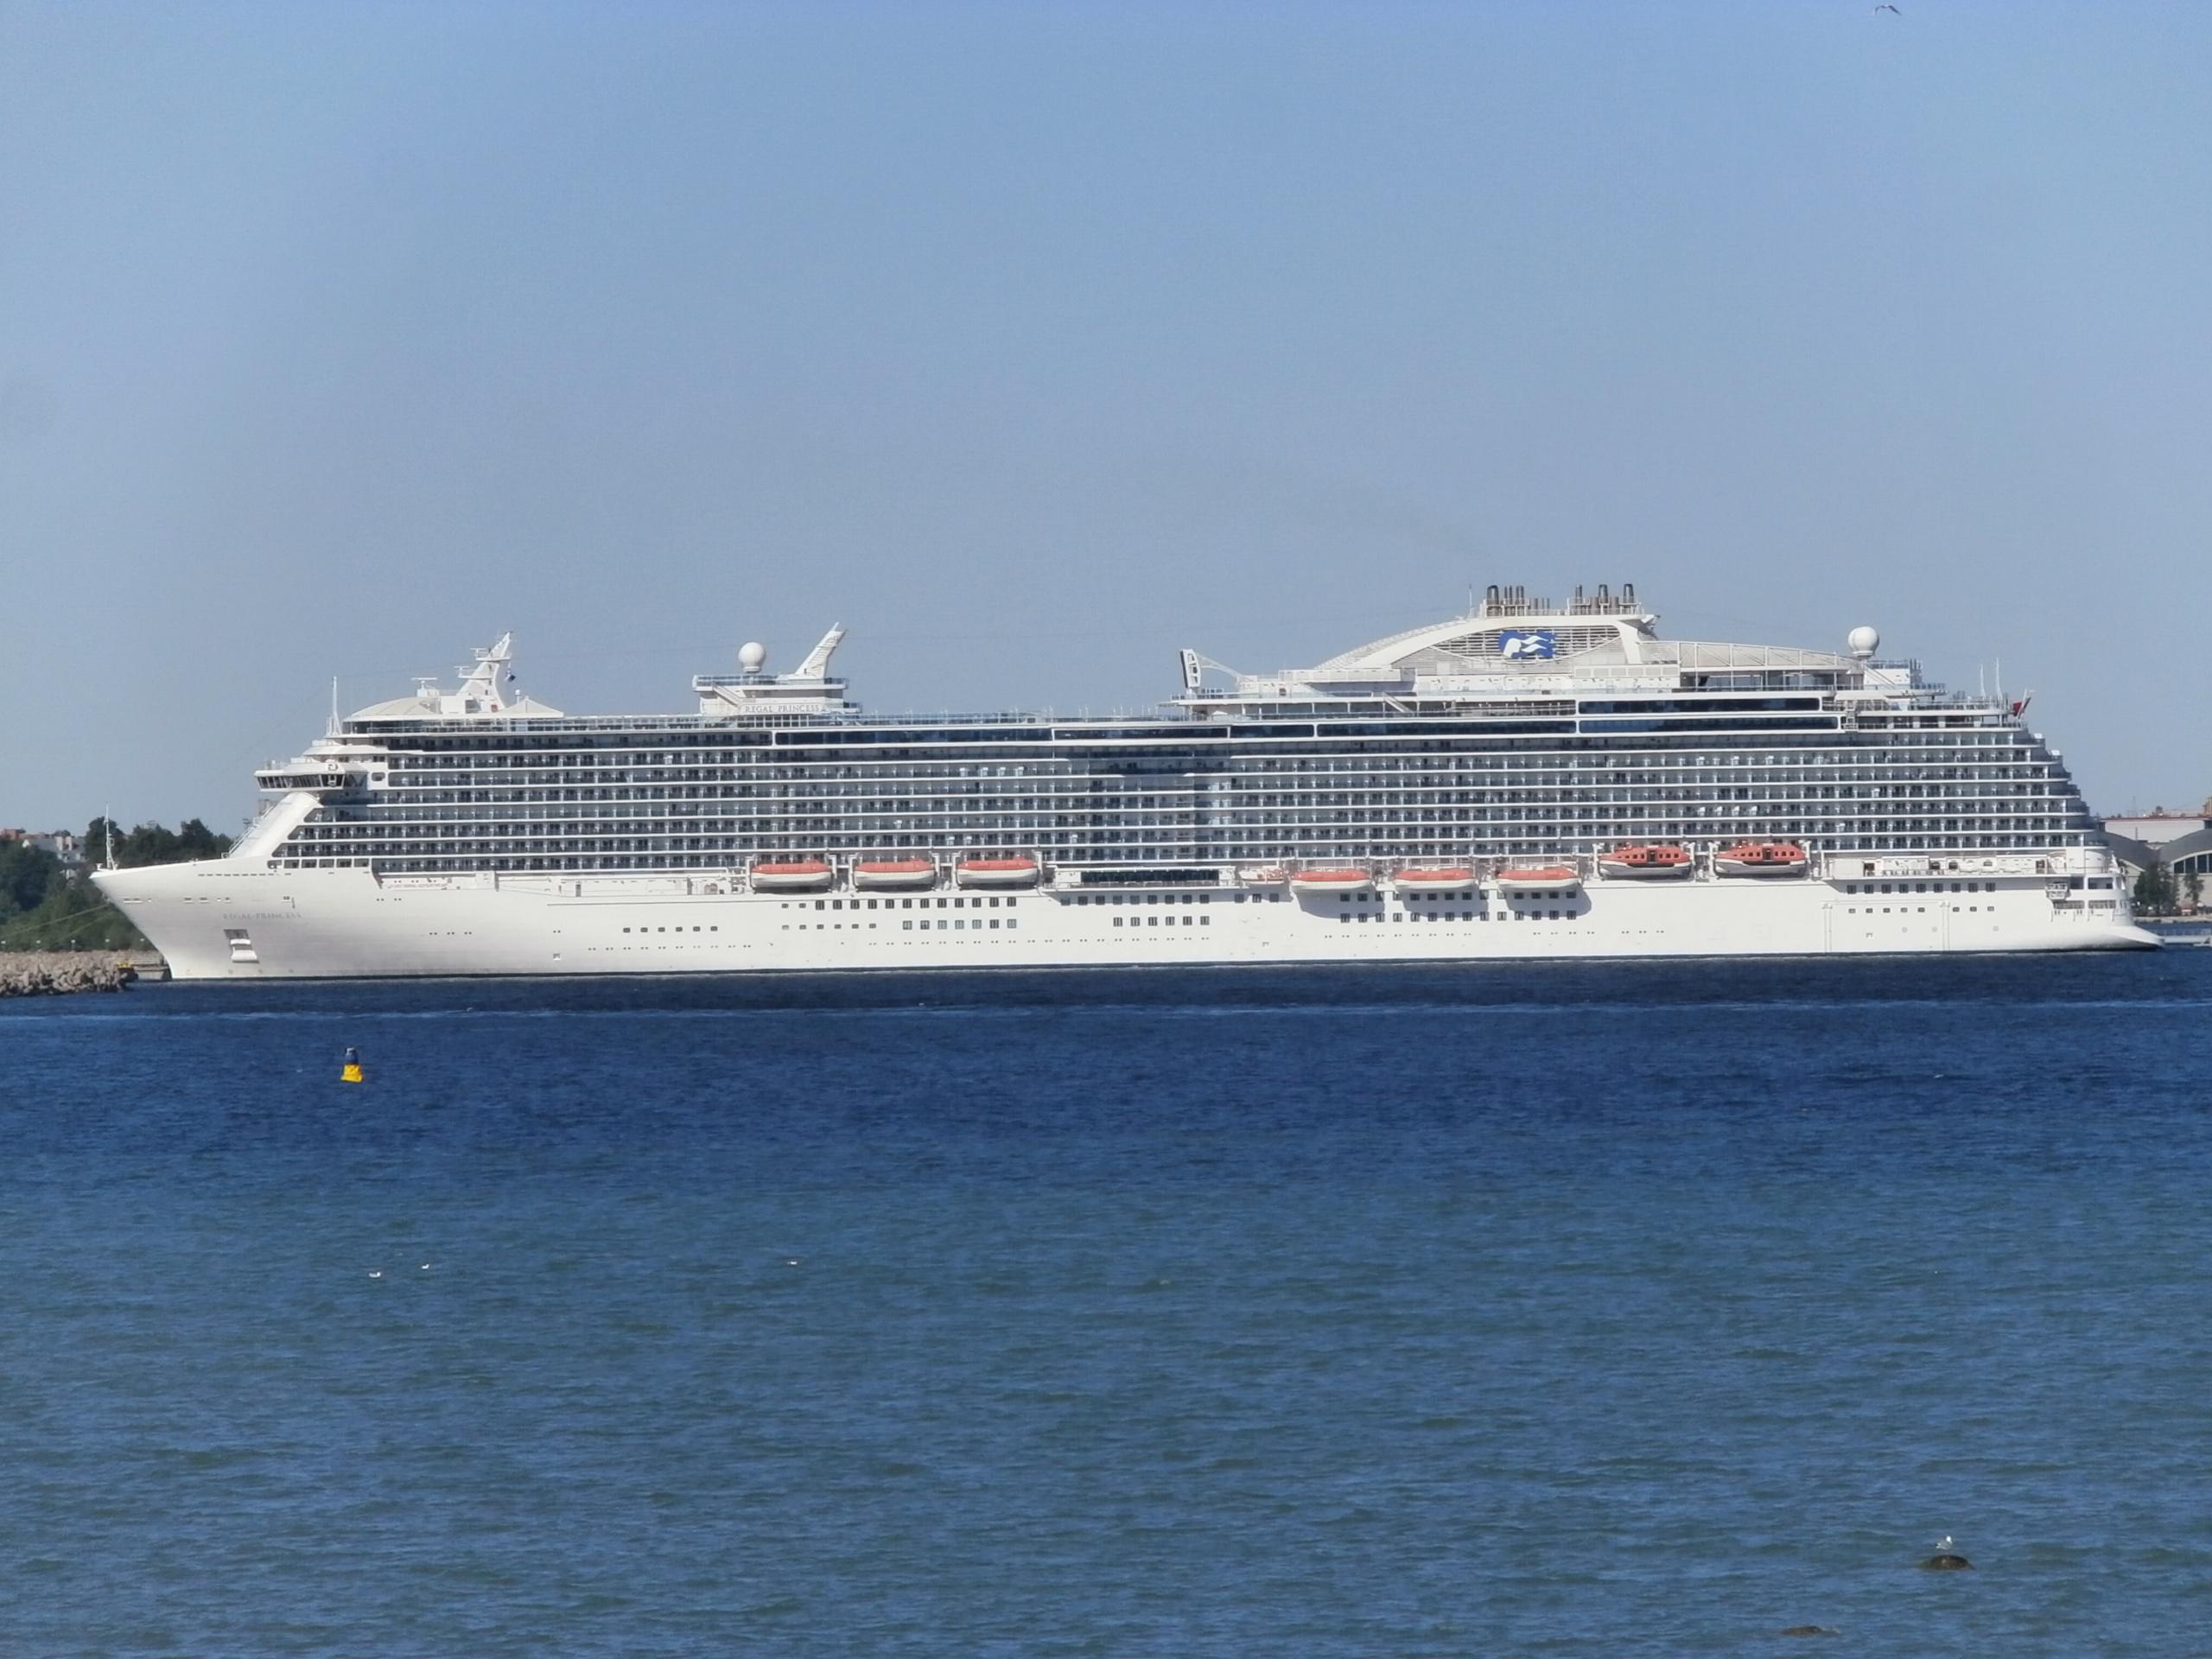 FileRegal Princess Port Side Tallinn June JPG Wikimedia - Port side of a cruise ship